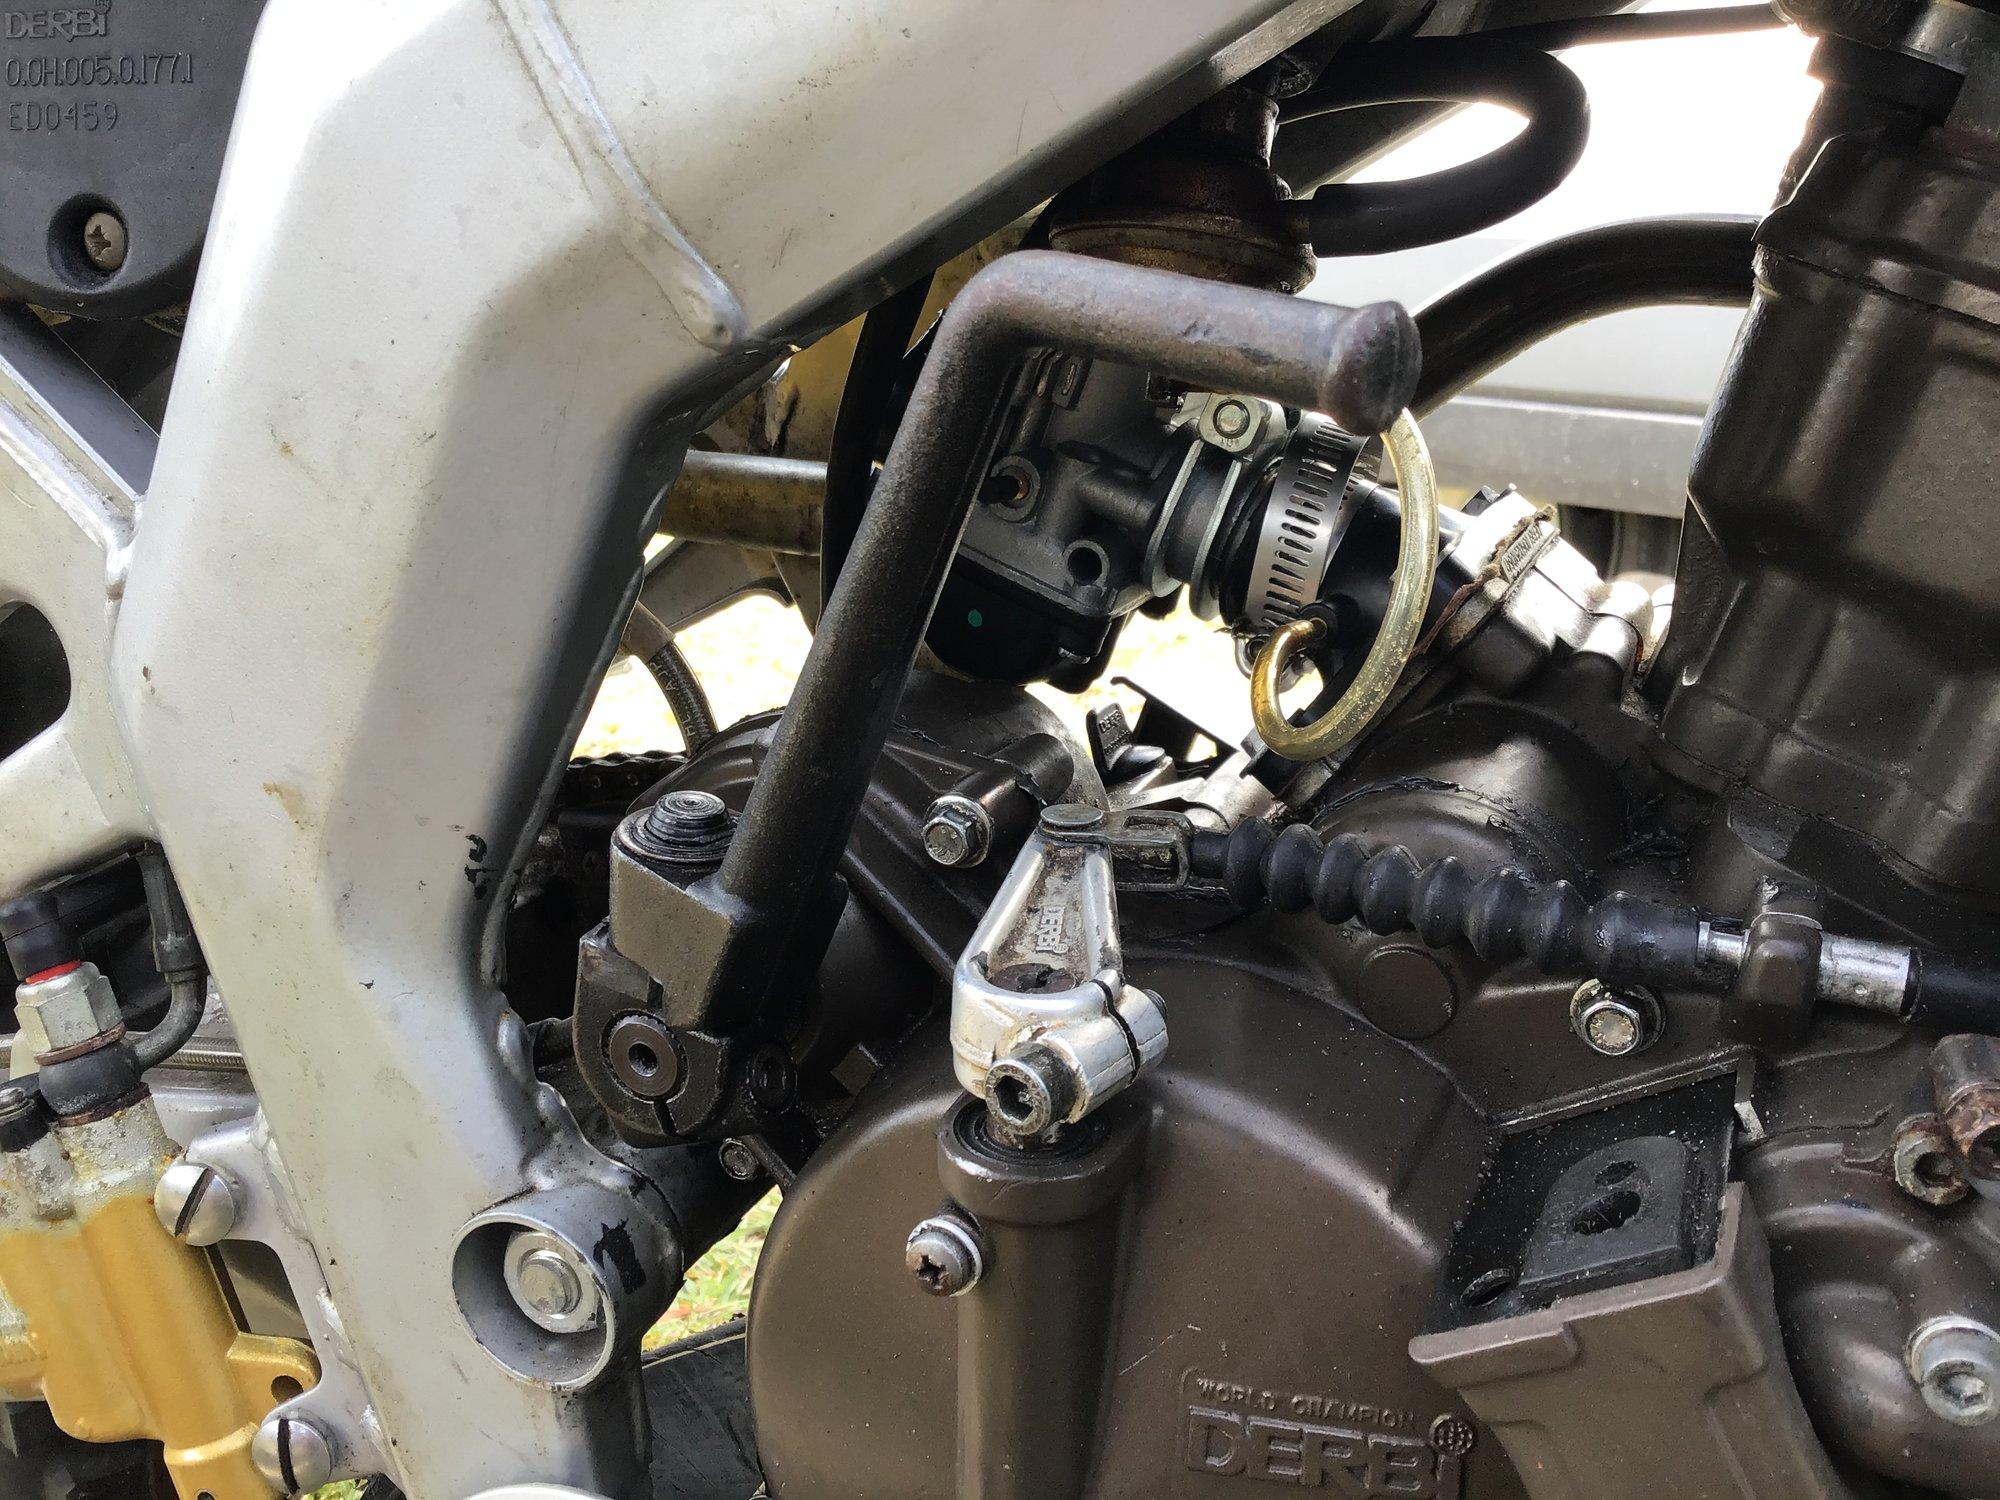 6DB8E40E-137A-4EF5-927F-B35B95FE44B9.jpeg